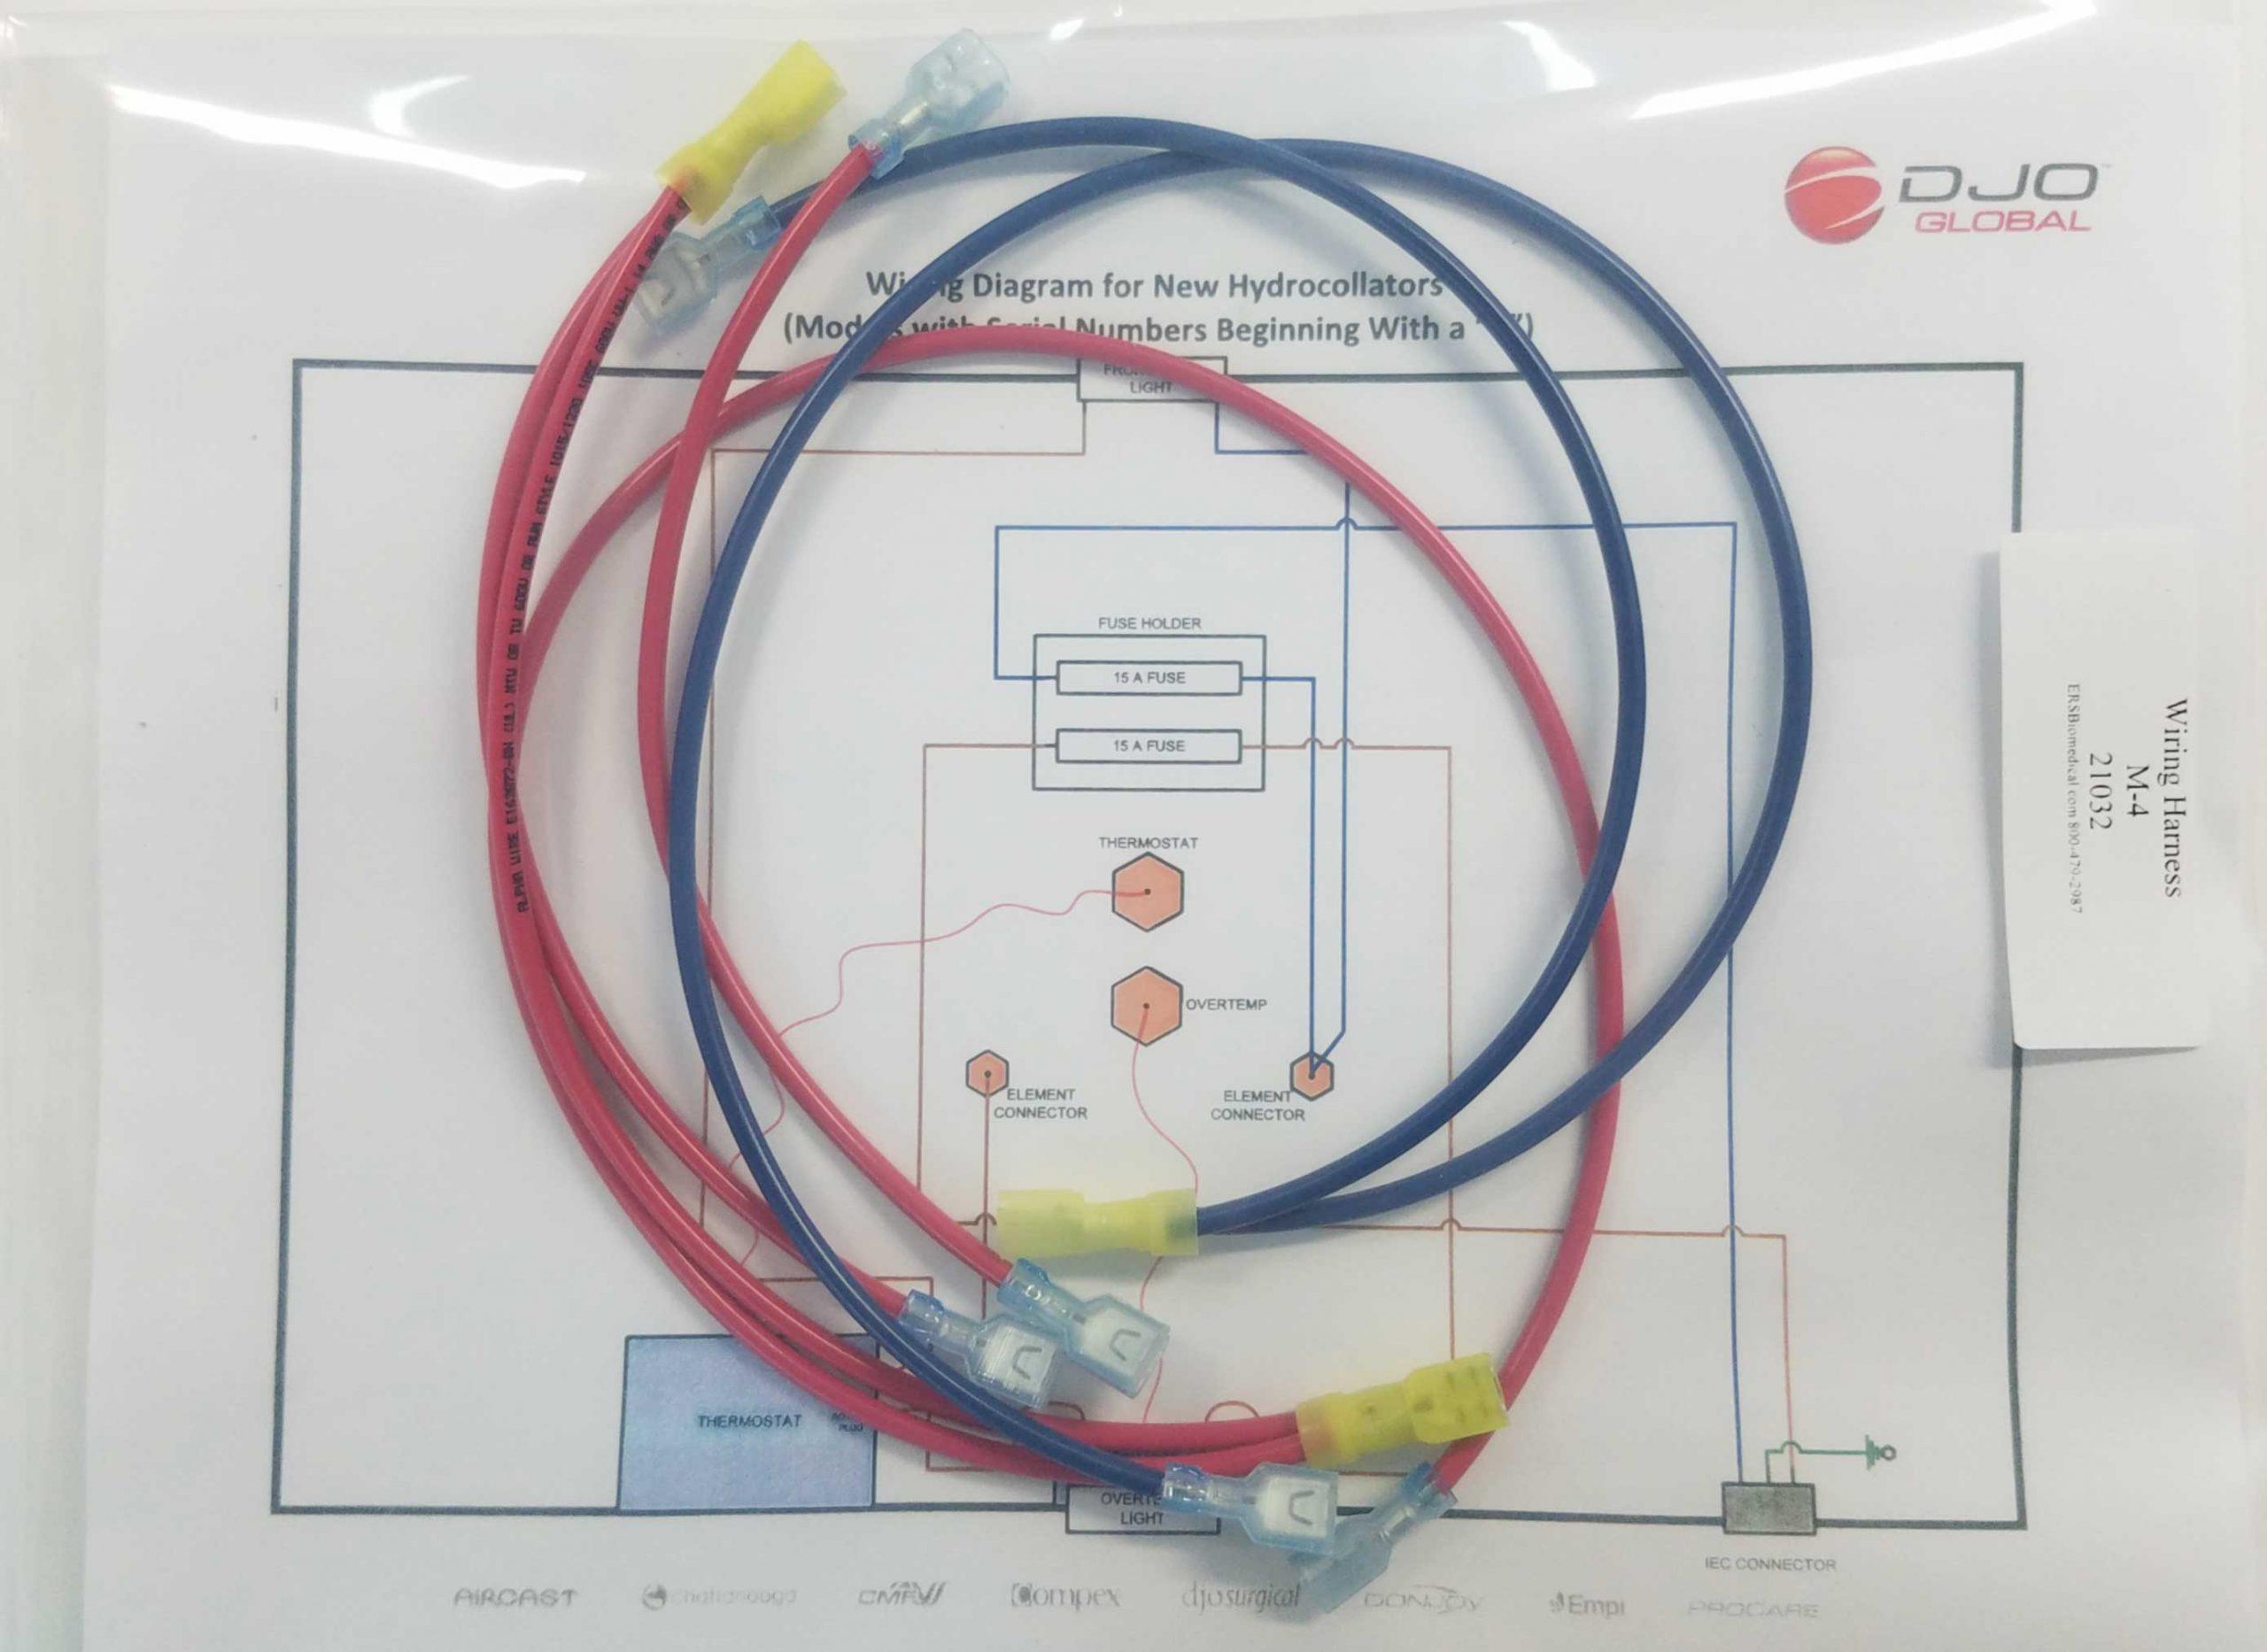 21617 Harness Wiring M-4 Hydrocollator Units - MRChattanooga, LLC | Hydrocollator Wiring Diagram |  | MR Chattanooga, LLC